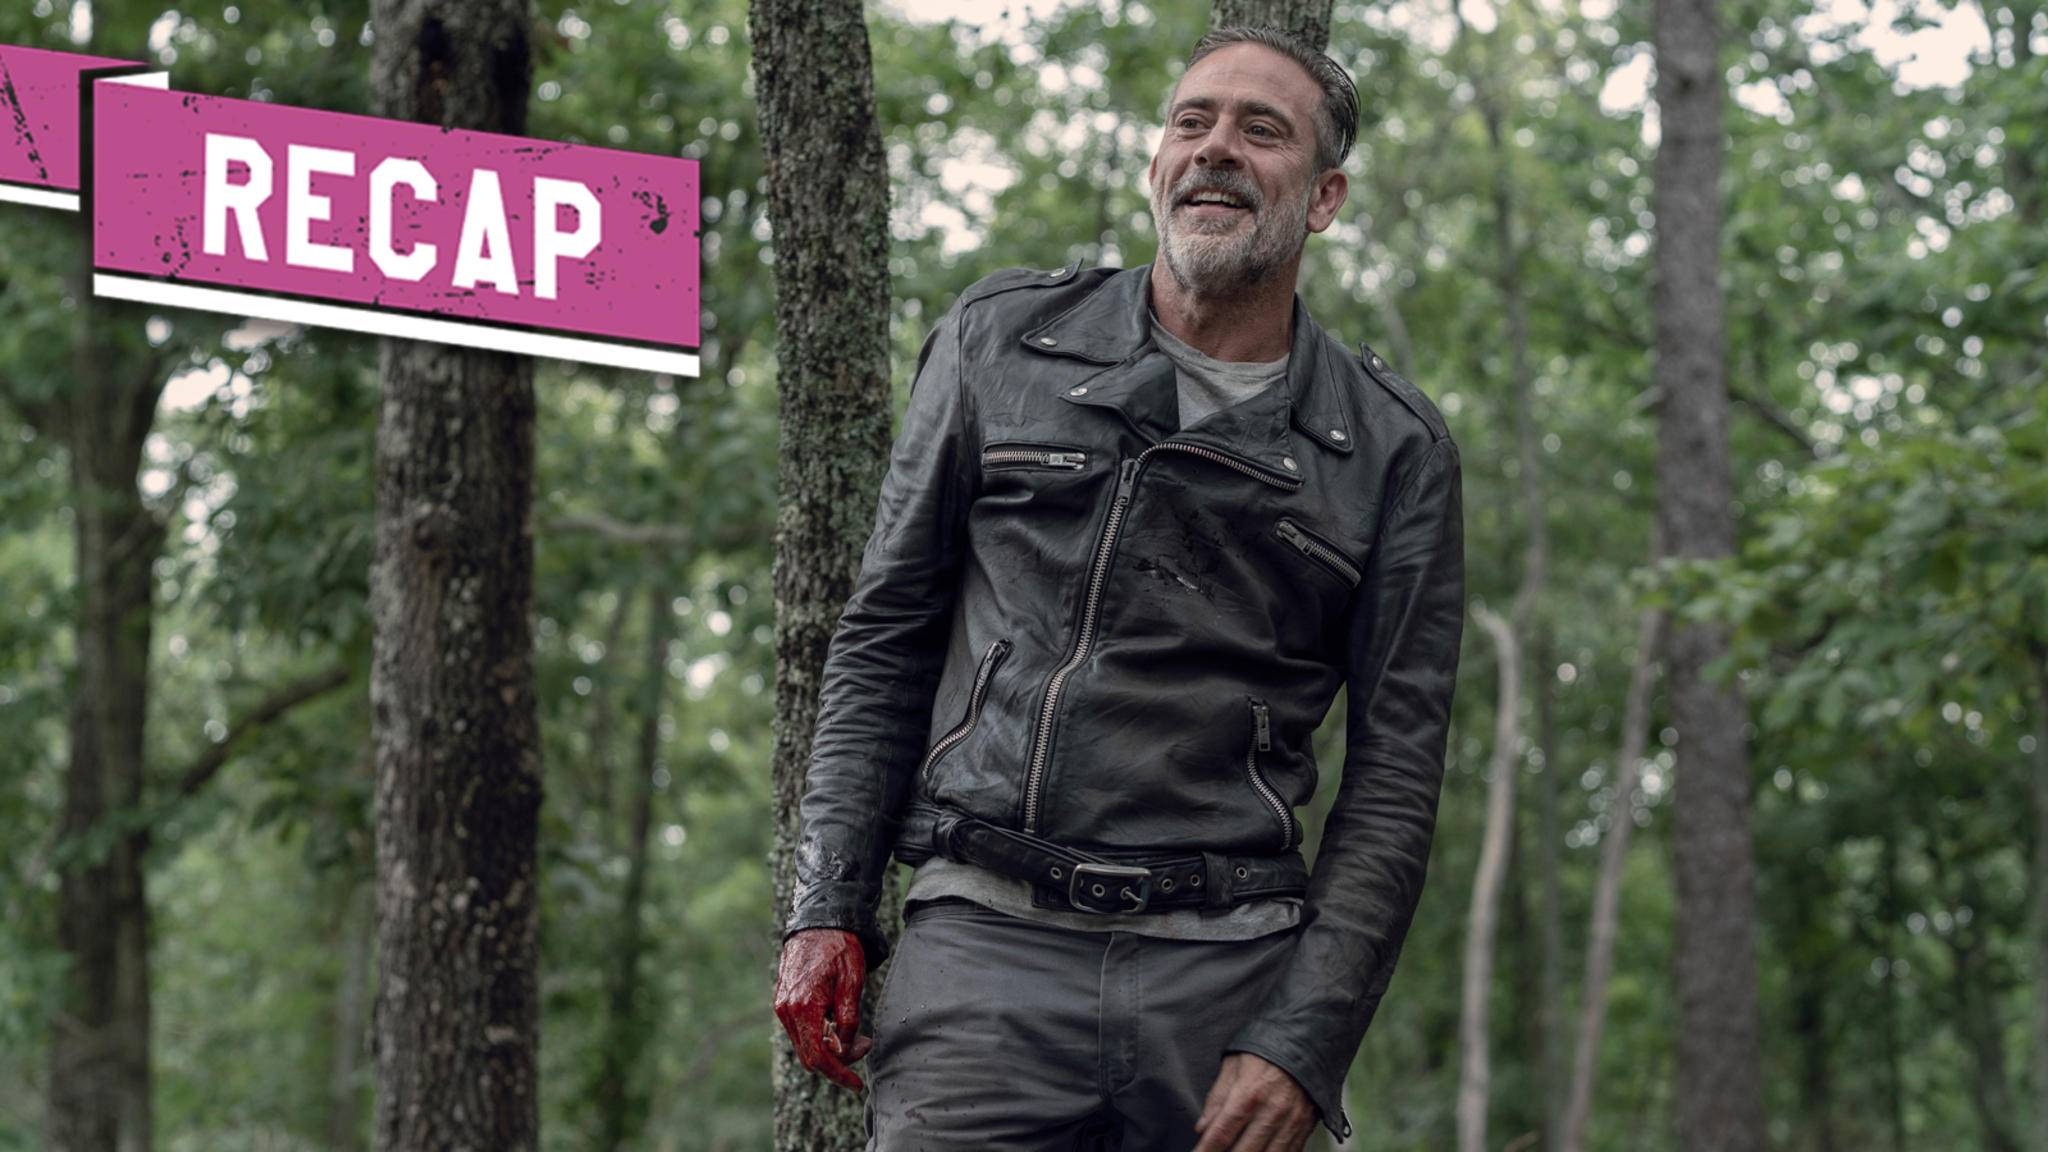 The-Walking-Dead-S10E06-Negan-Jace-Downs-AMC-Teaserbild